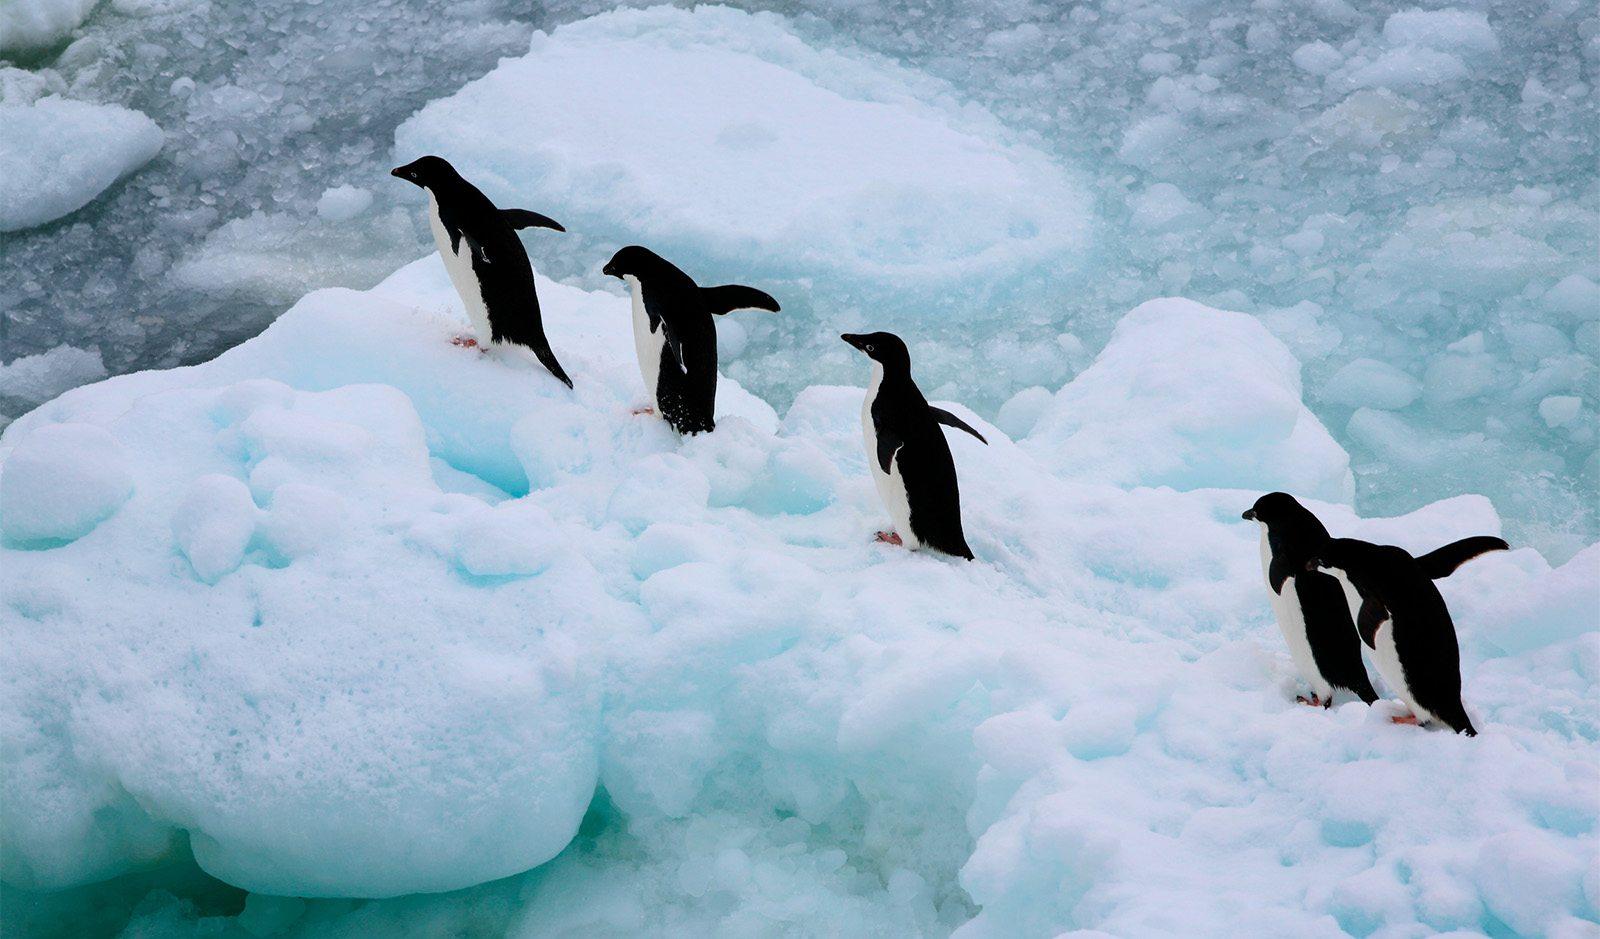 https://www.greenpeace.org/usa/wp-content/uploads/2018/01/penguins-hero-match.jpg